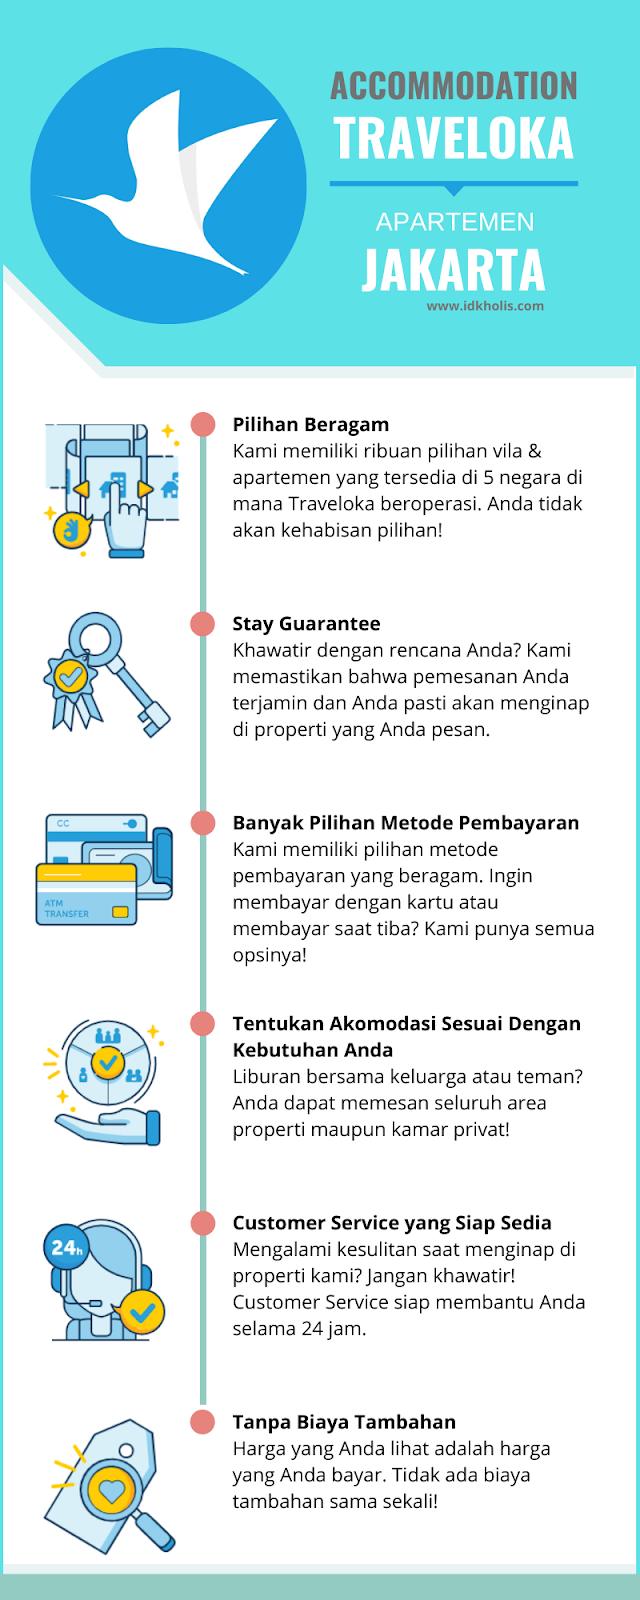 Alasan Harus Pesan Apartemen di Jakarta Melalui Traveloka